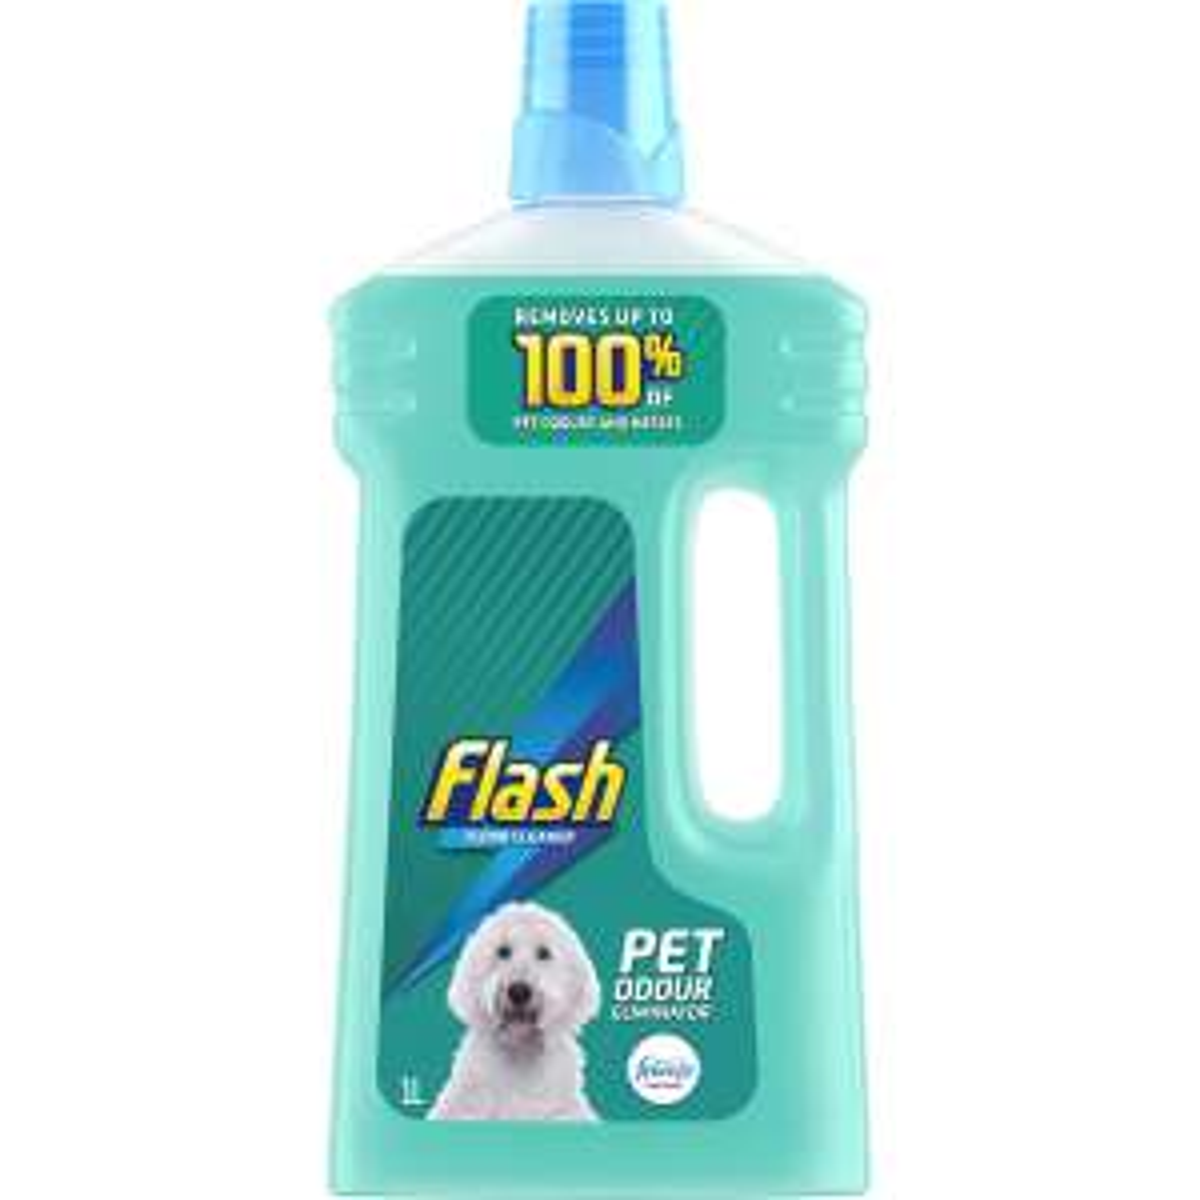 Flash Pet Floor Cleaner Liquid - 1L for 1.99 at Robert Dyas